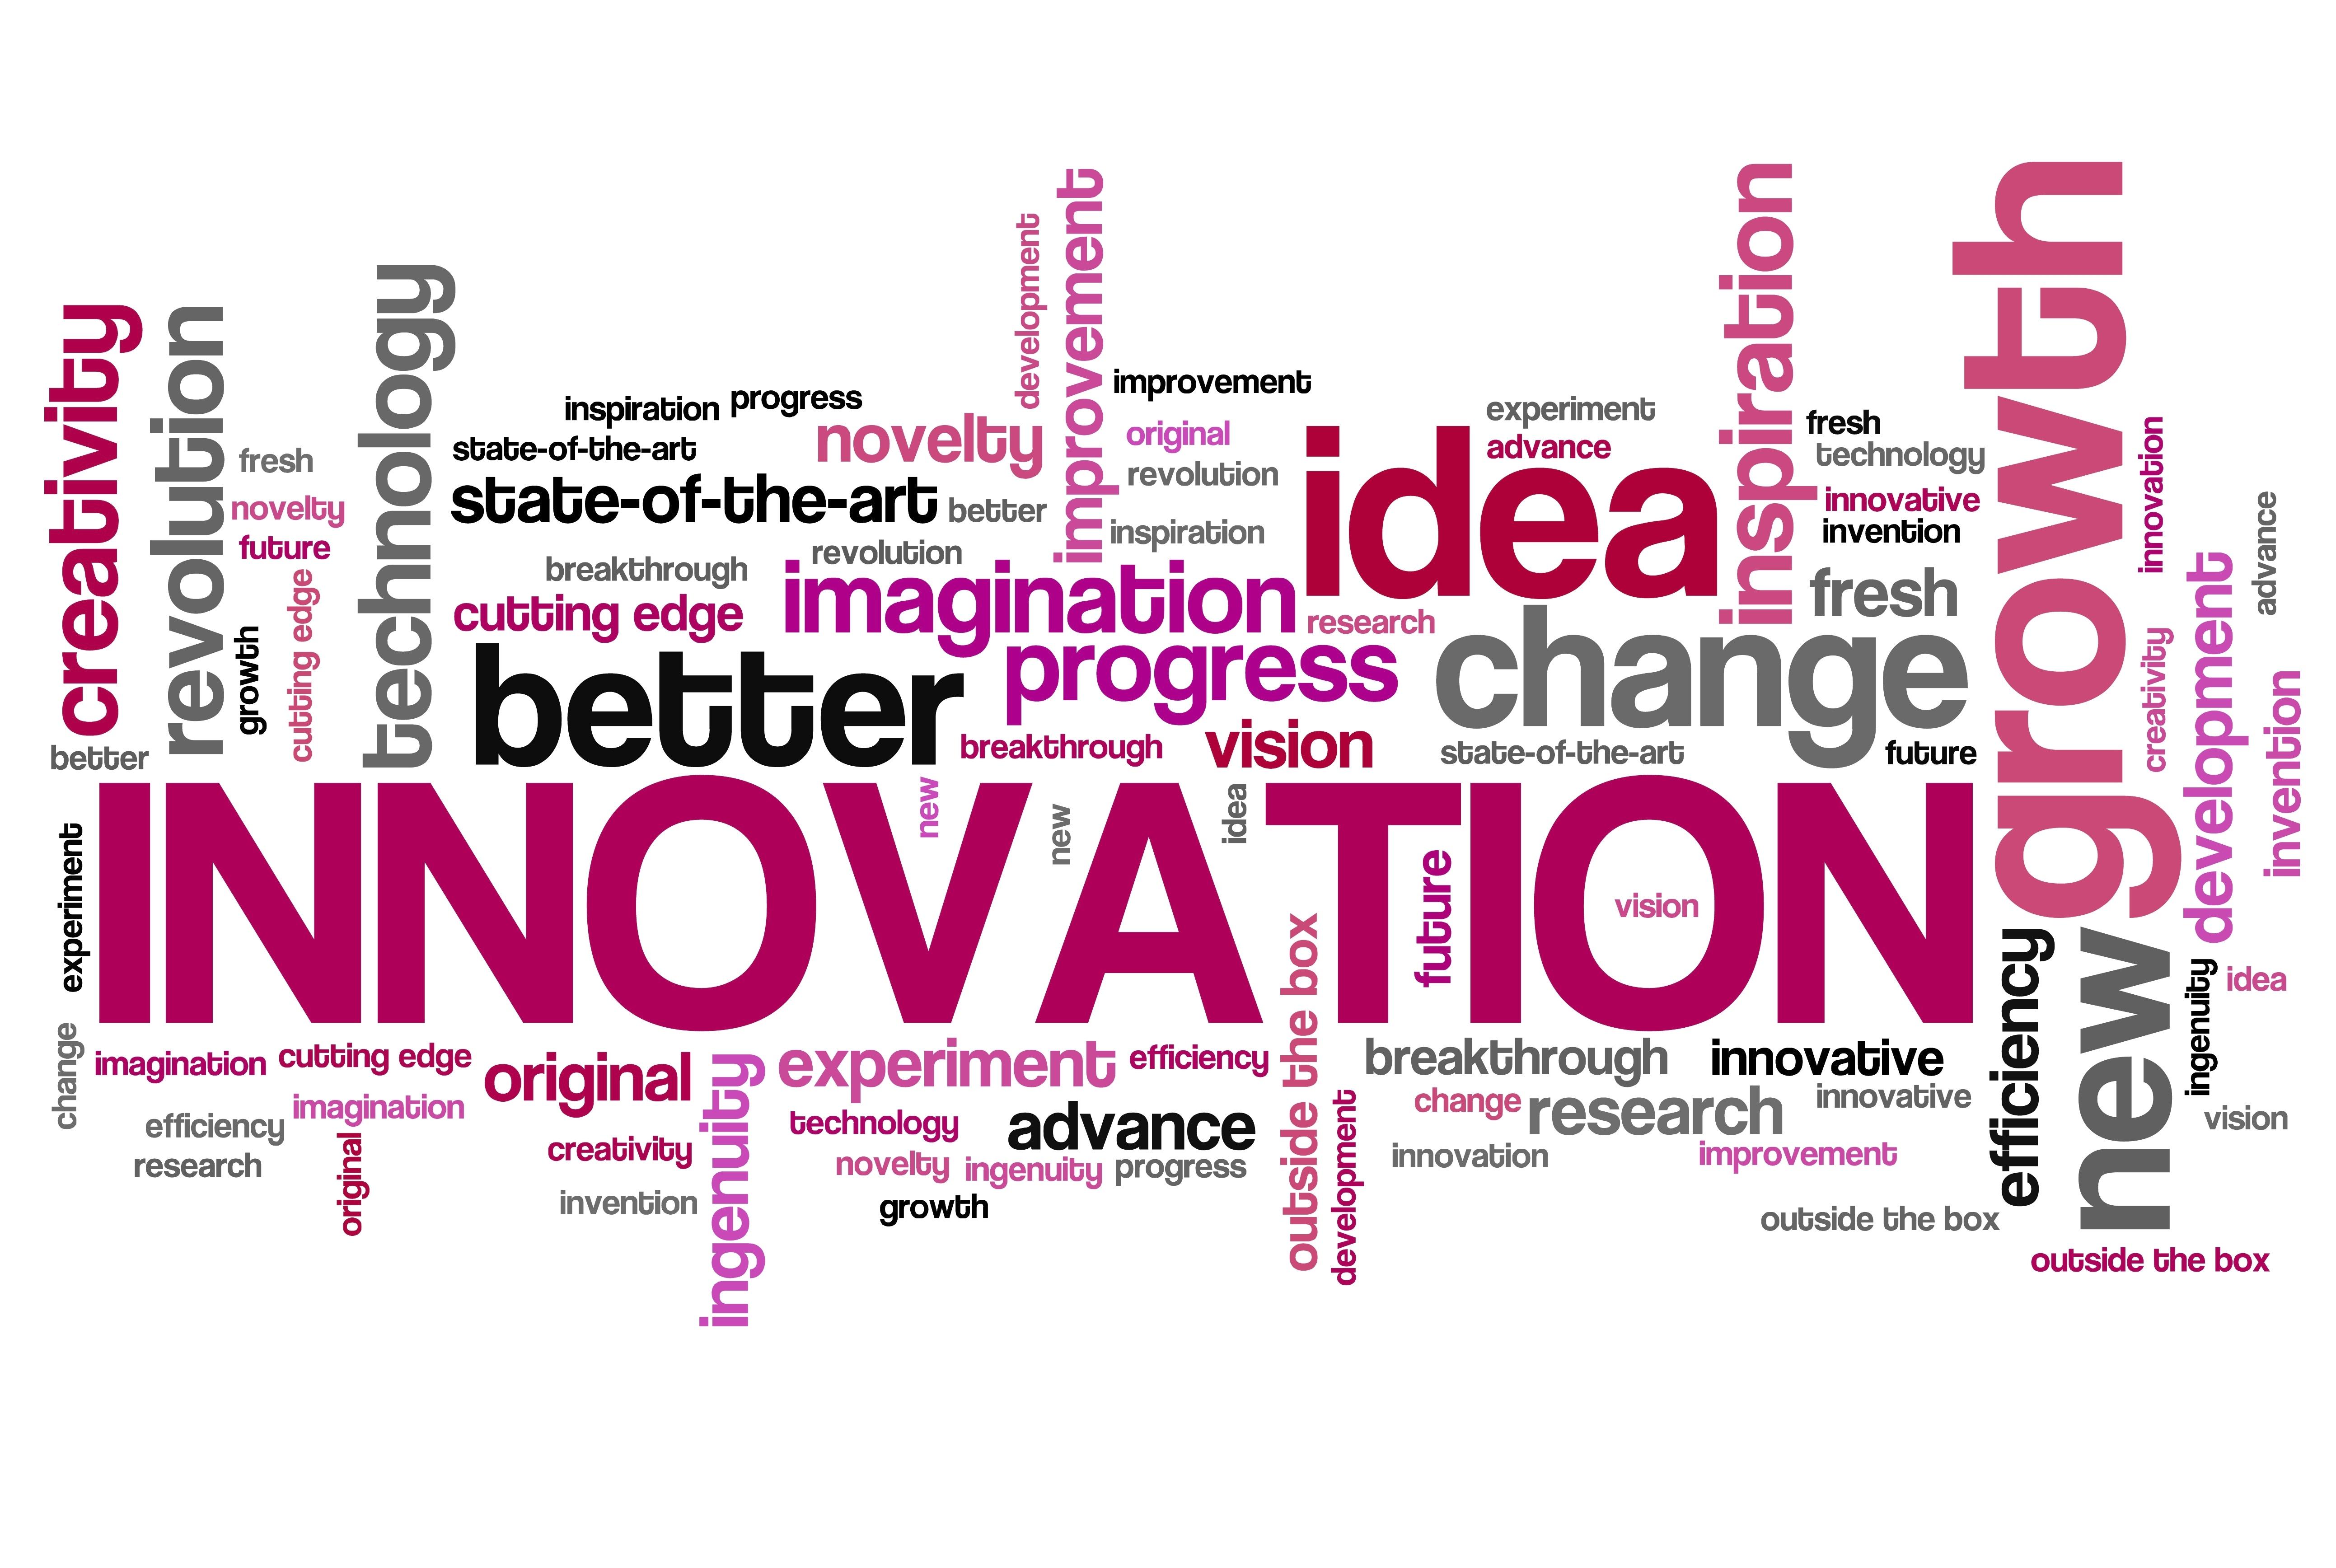 Technology Management Image: European Institute Of Innovation